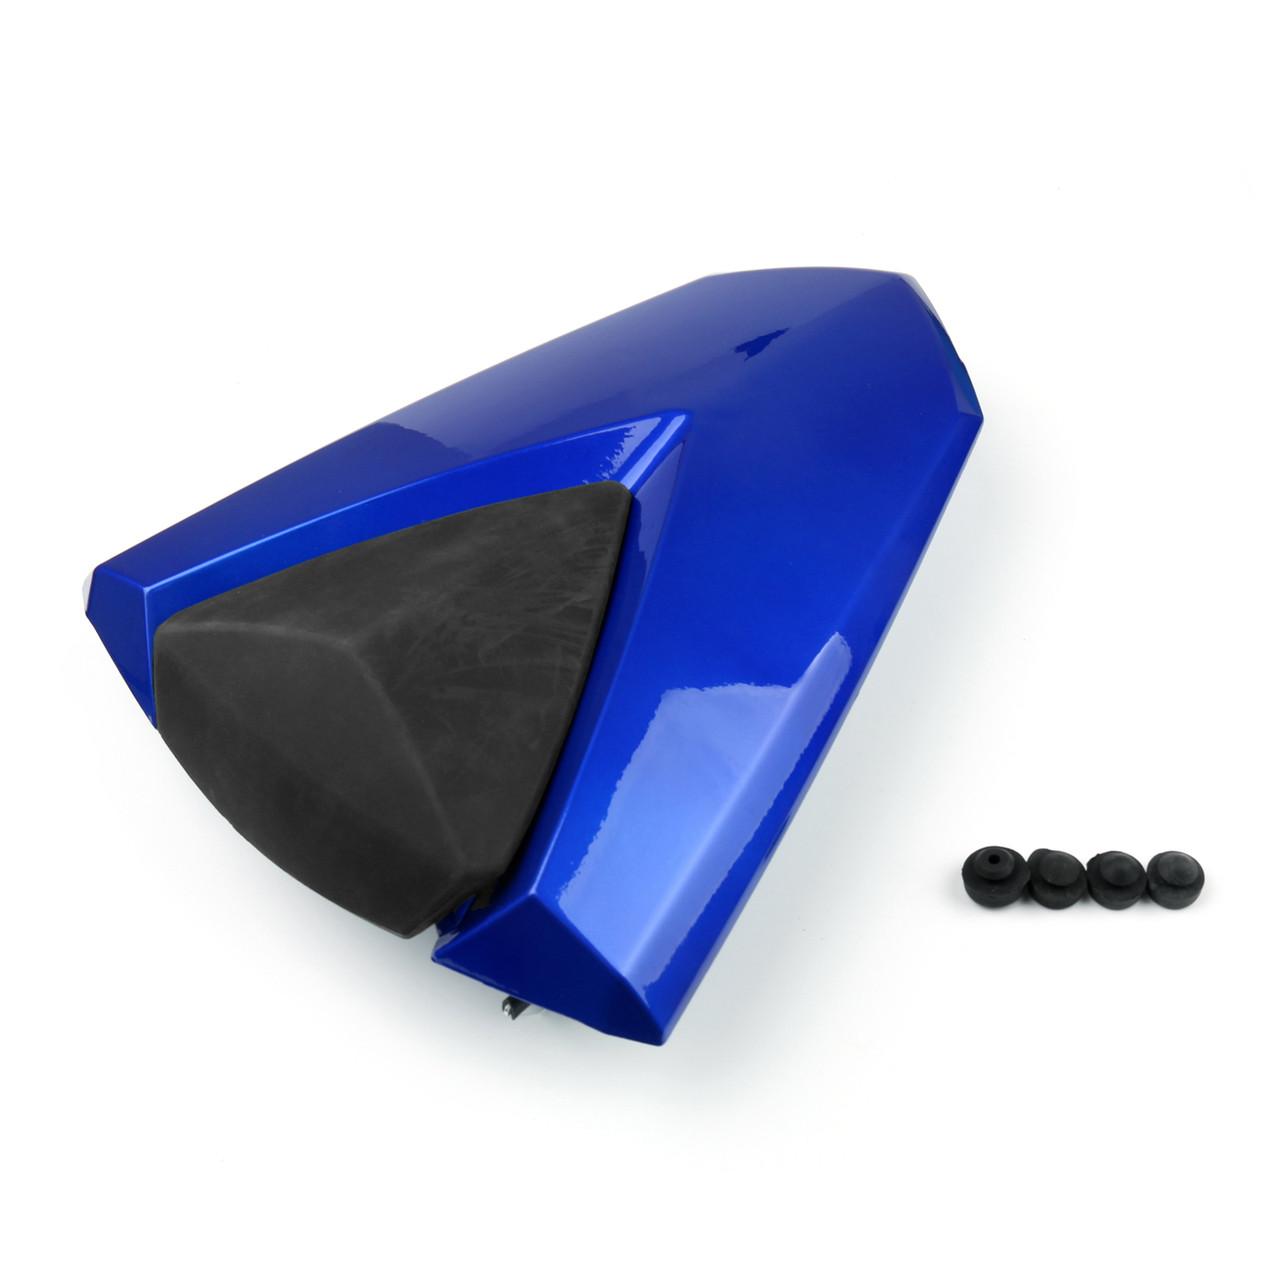 http://www.madhornets.store/AMZ/MotoPart/SeatCowl/M511-Y010/M511-Y010-Blue-1.jpg